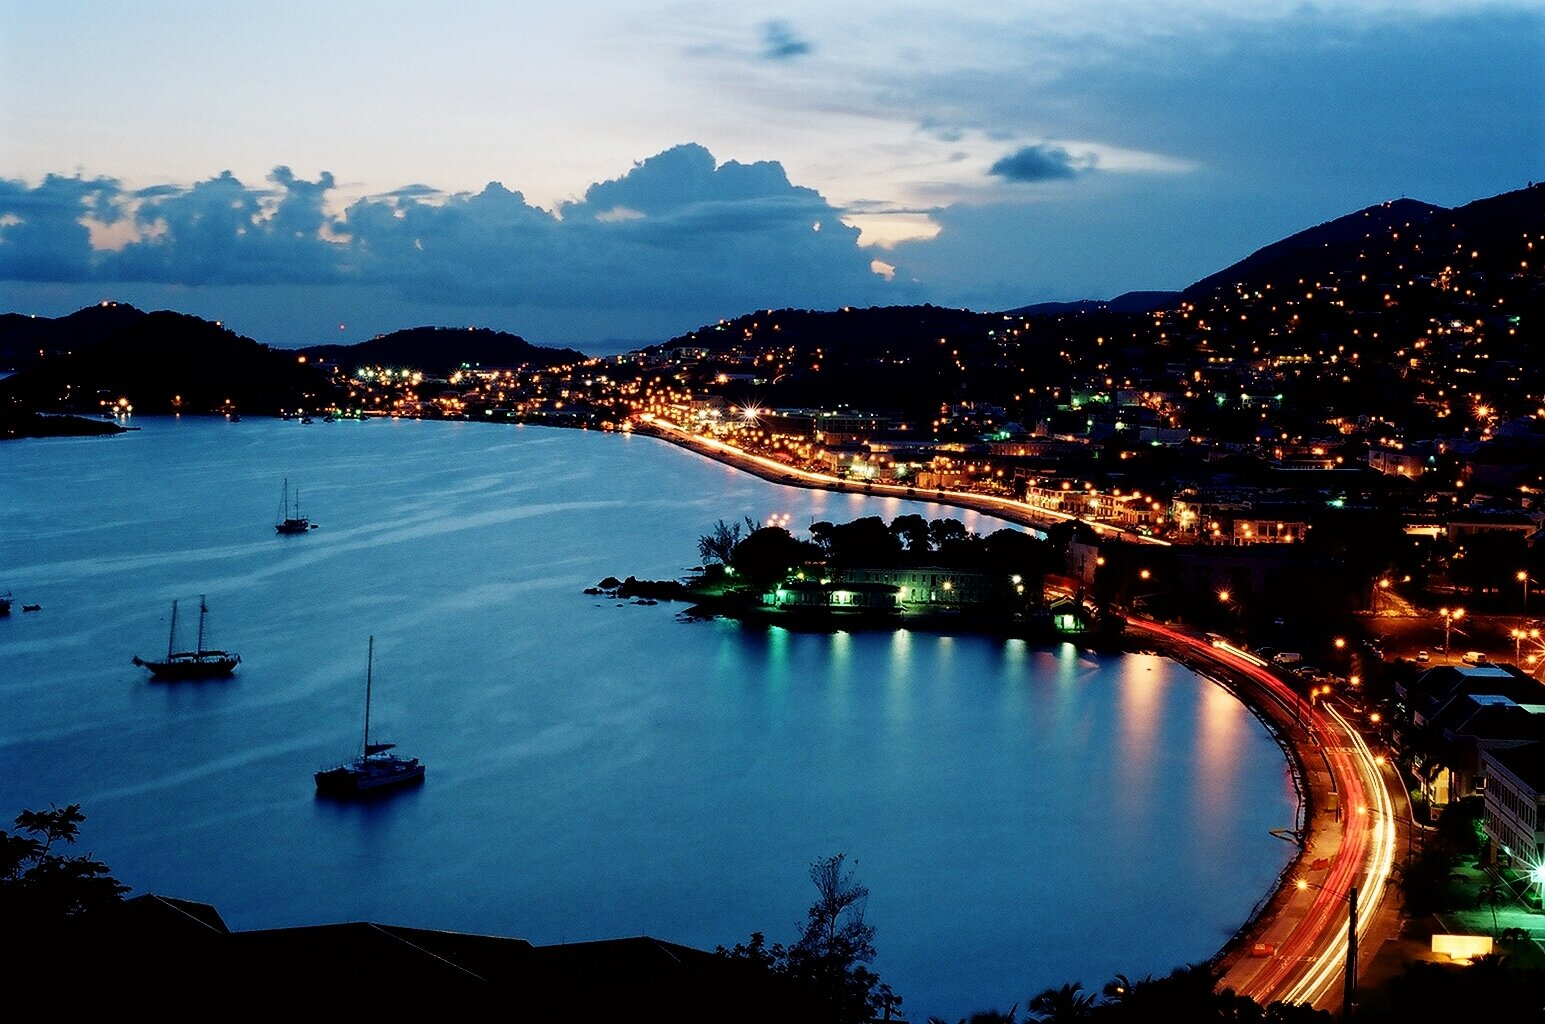 caribbean islands images charlotte amalie @ night, stt hd wallpaper